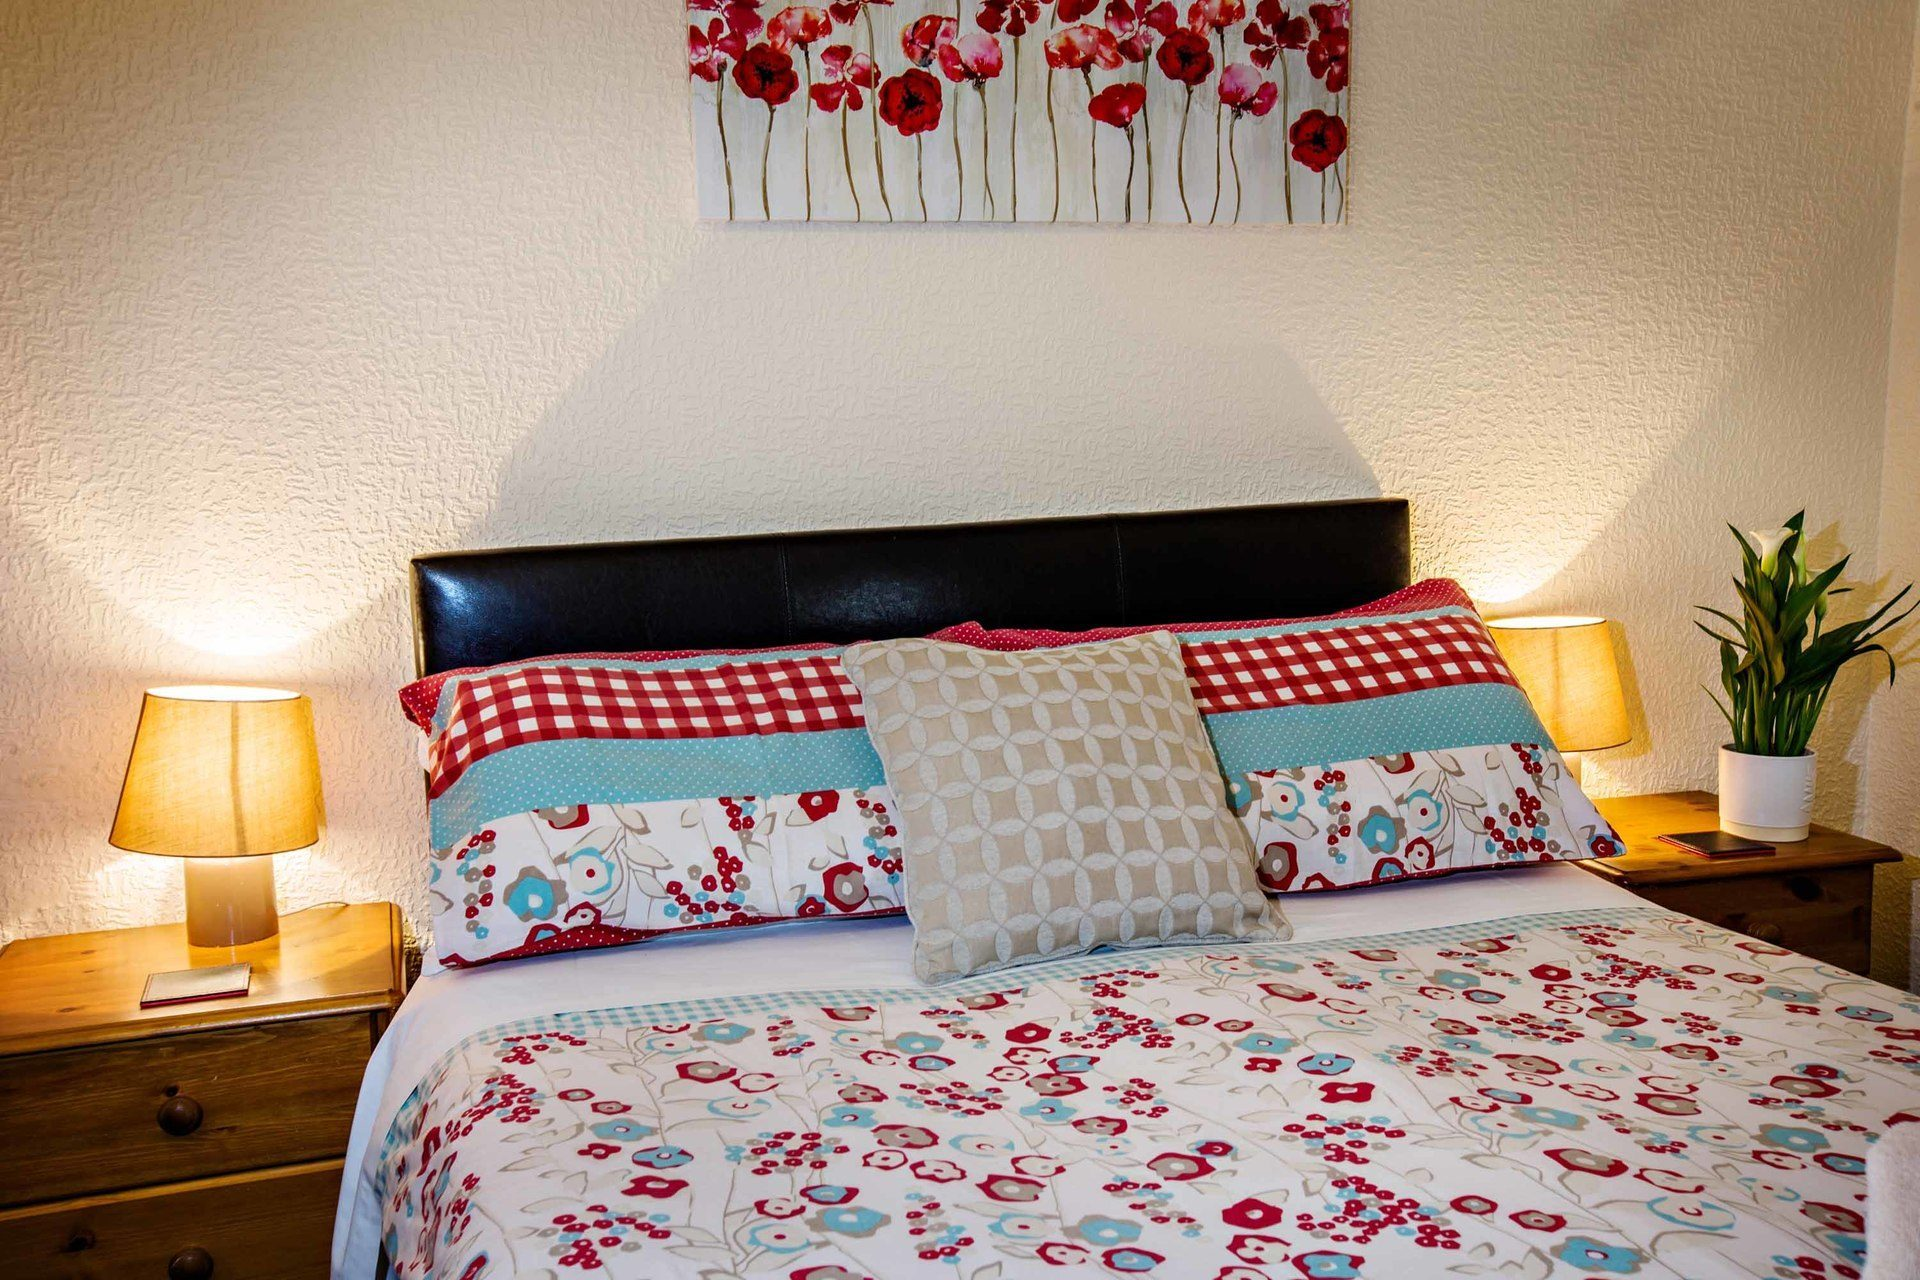 interior bedroom 3